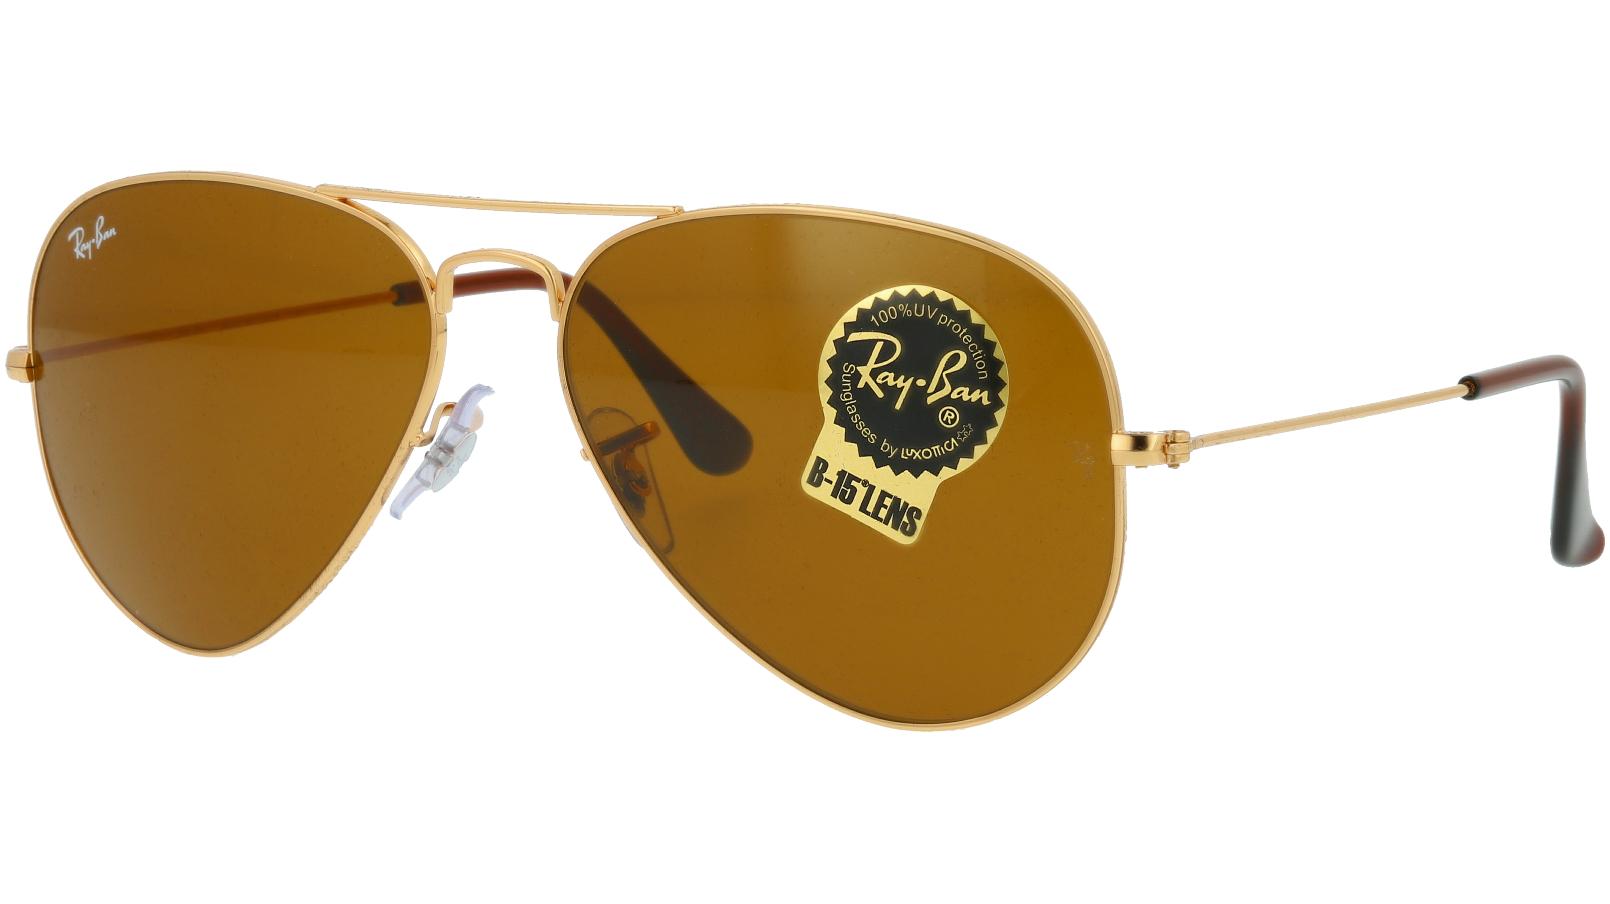 Ray-Ban RB3025 001/33 58 Arista Pilot Sunglasses